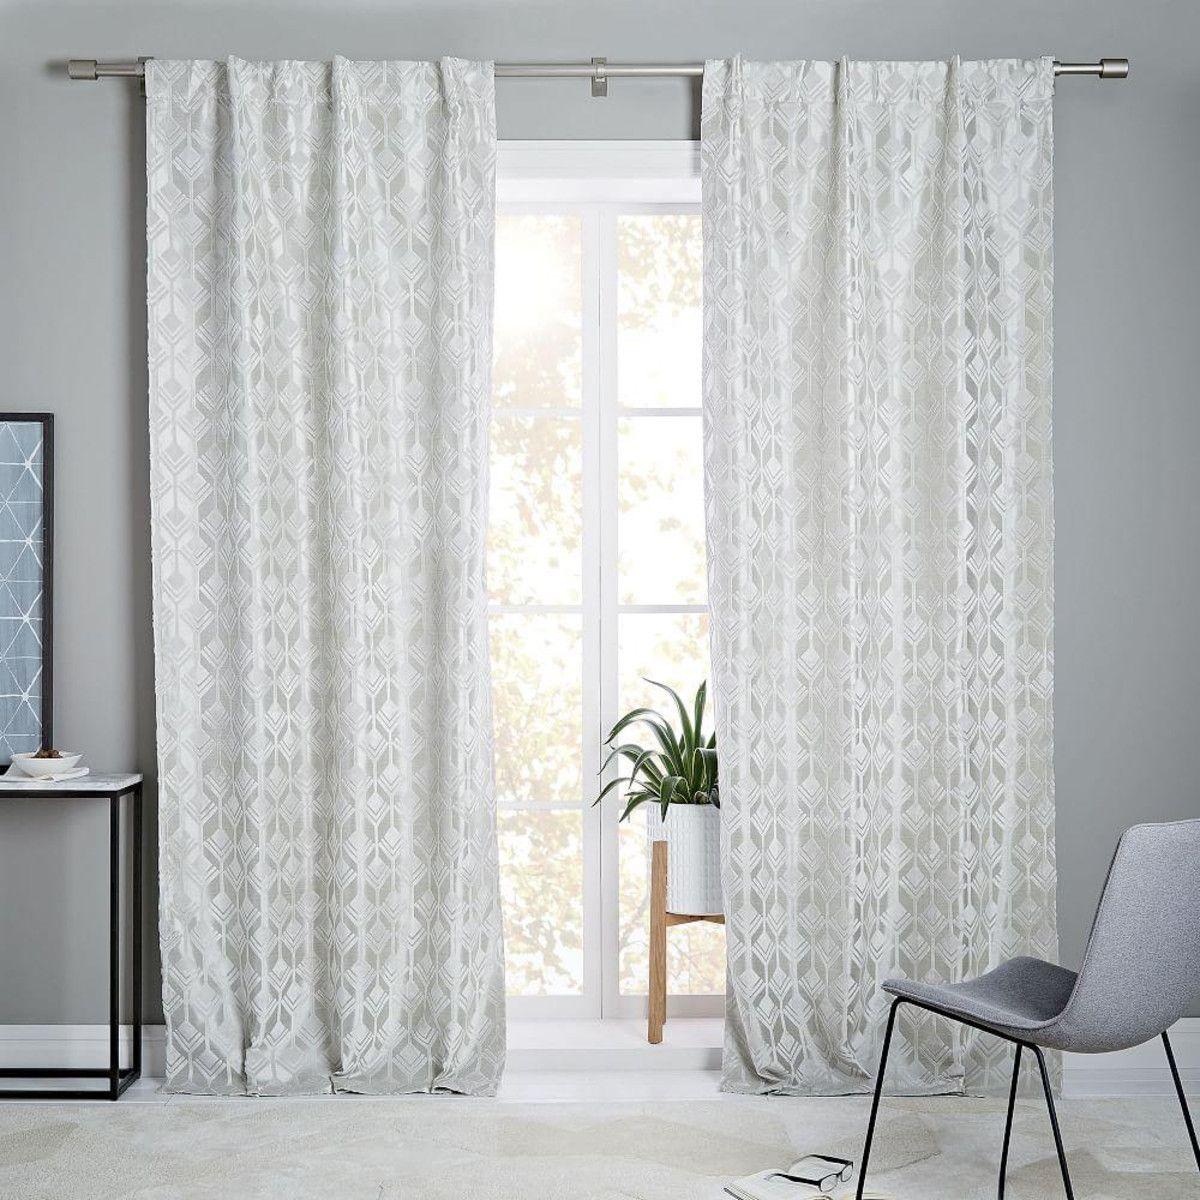 Geo tile velvet flocked curtain blackout lining frost - Blackout curtains for master bedroom ...